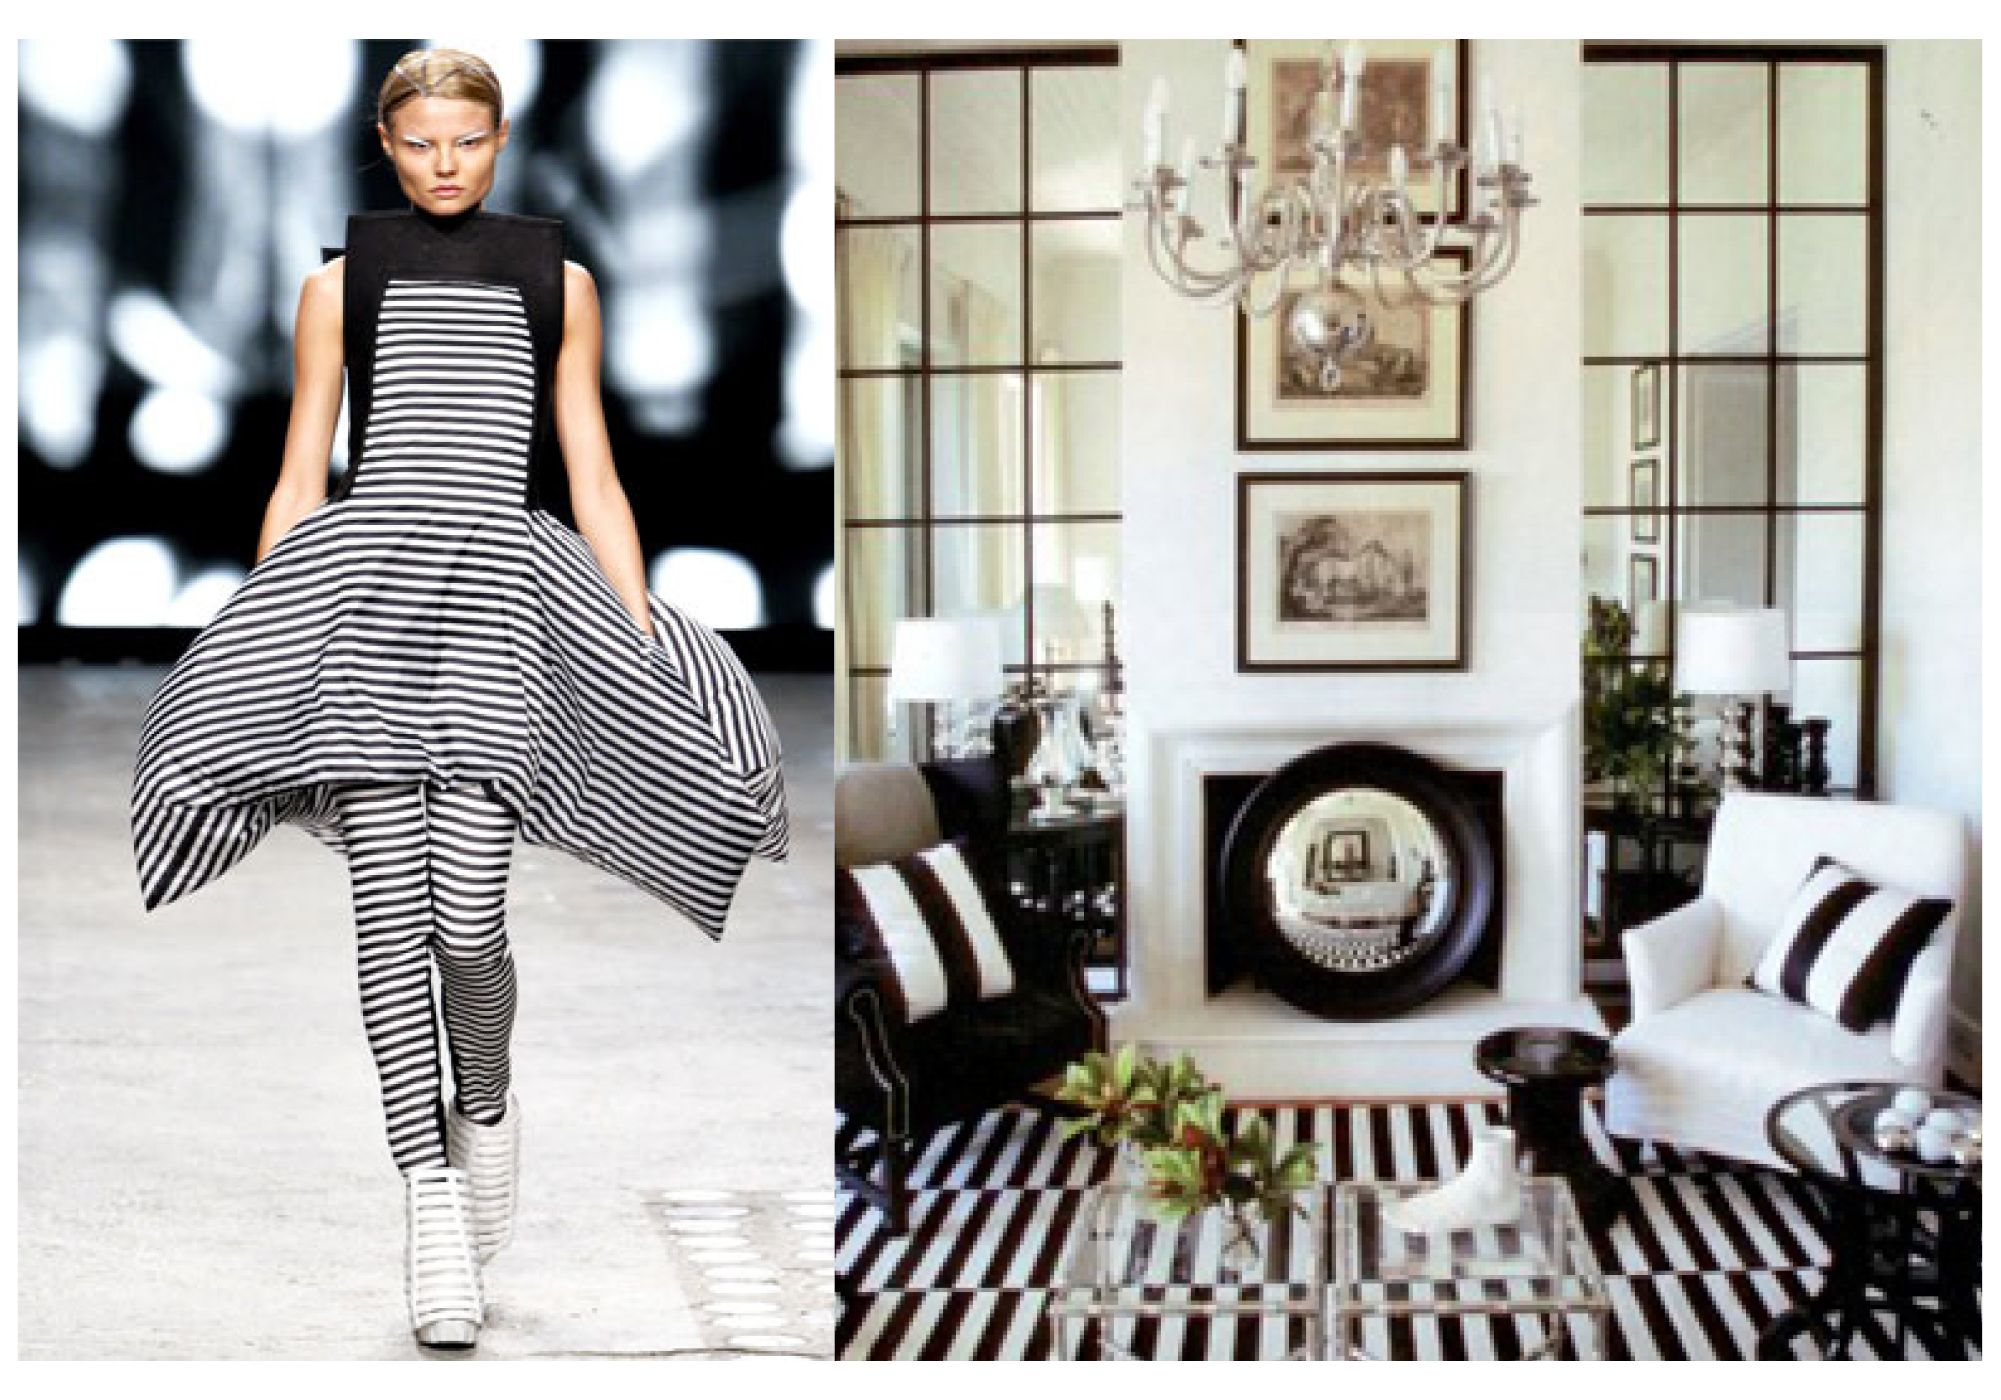 marvelous interior design inspired fashion i heart fashion rh pinterest com